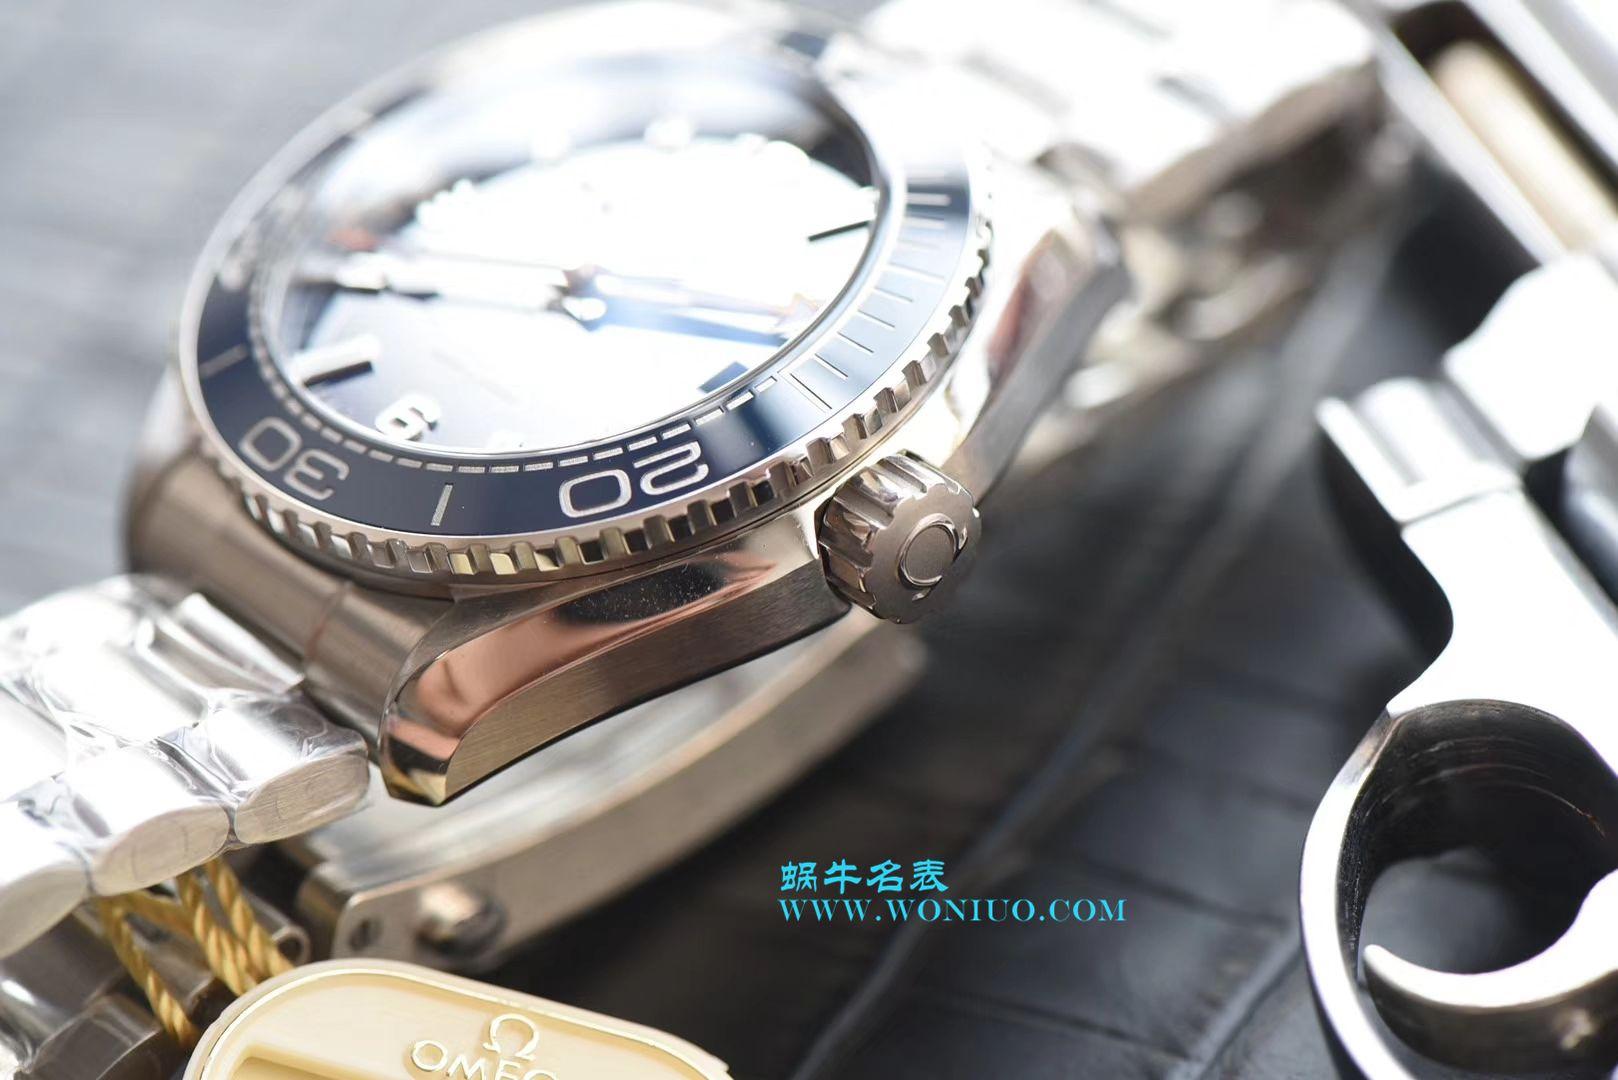 【SSS一比一超A复刻手表】欧米茄海马海洋宇宙600米腕表系列 215.30.44.21.03.001腕表 / M350